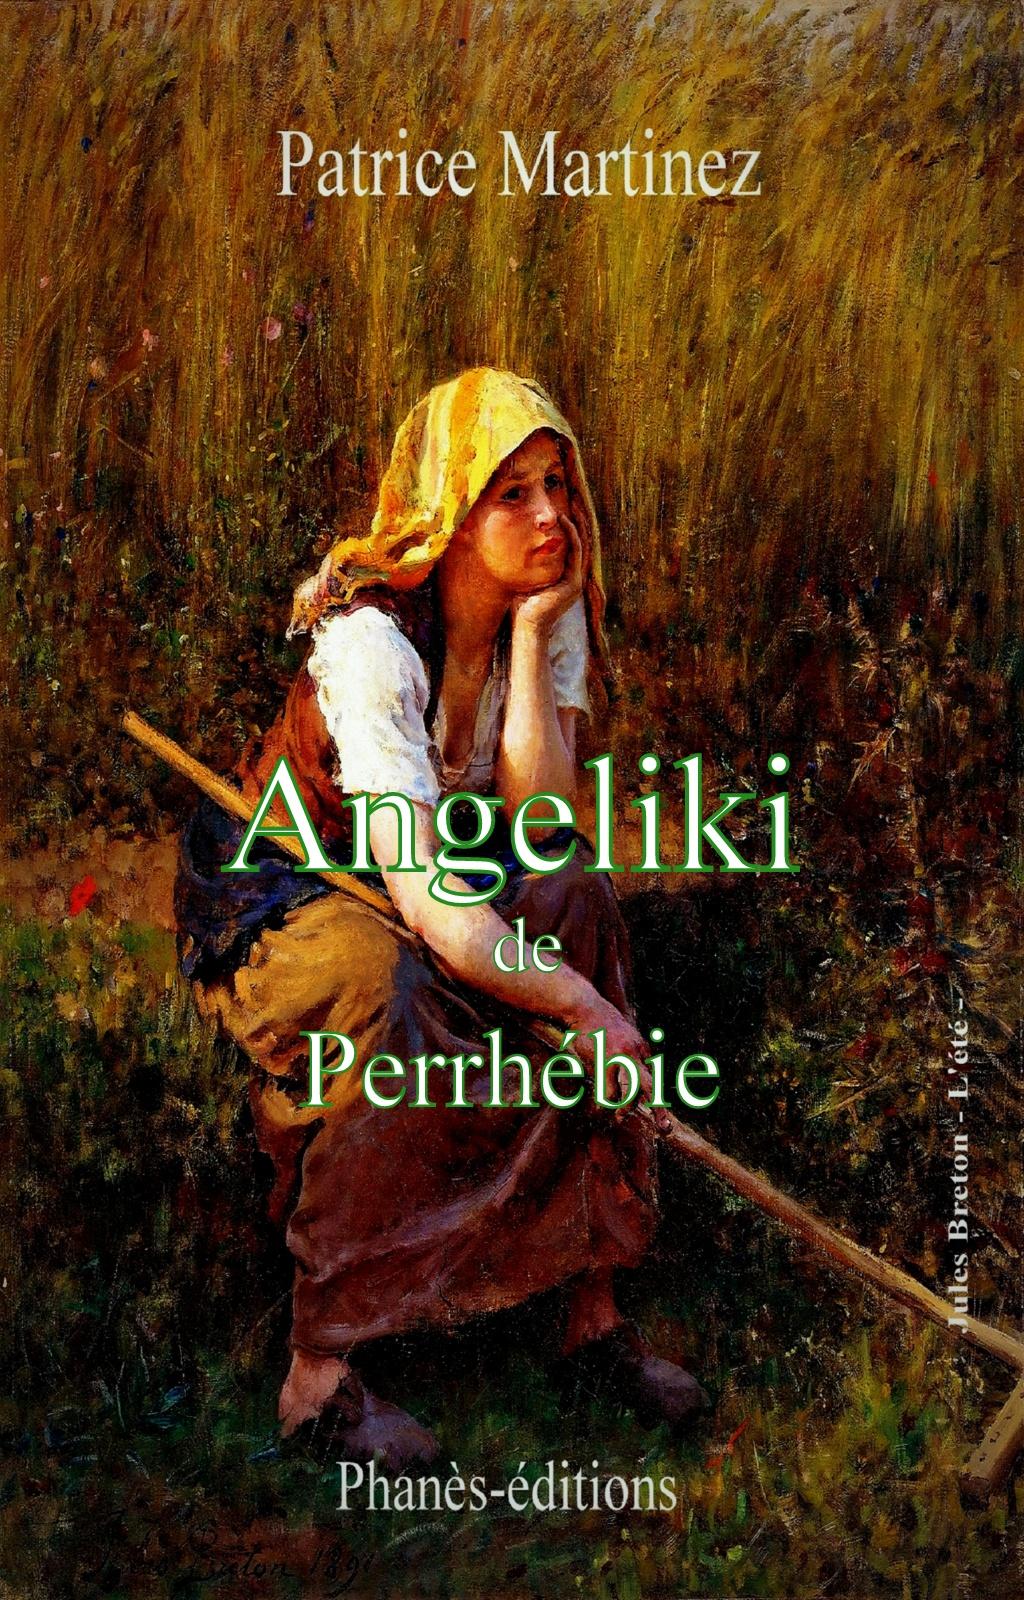 Angeliki de perrhébie